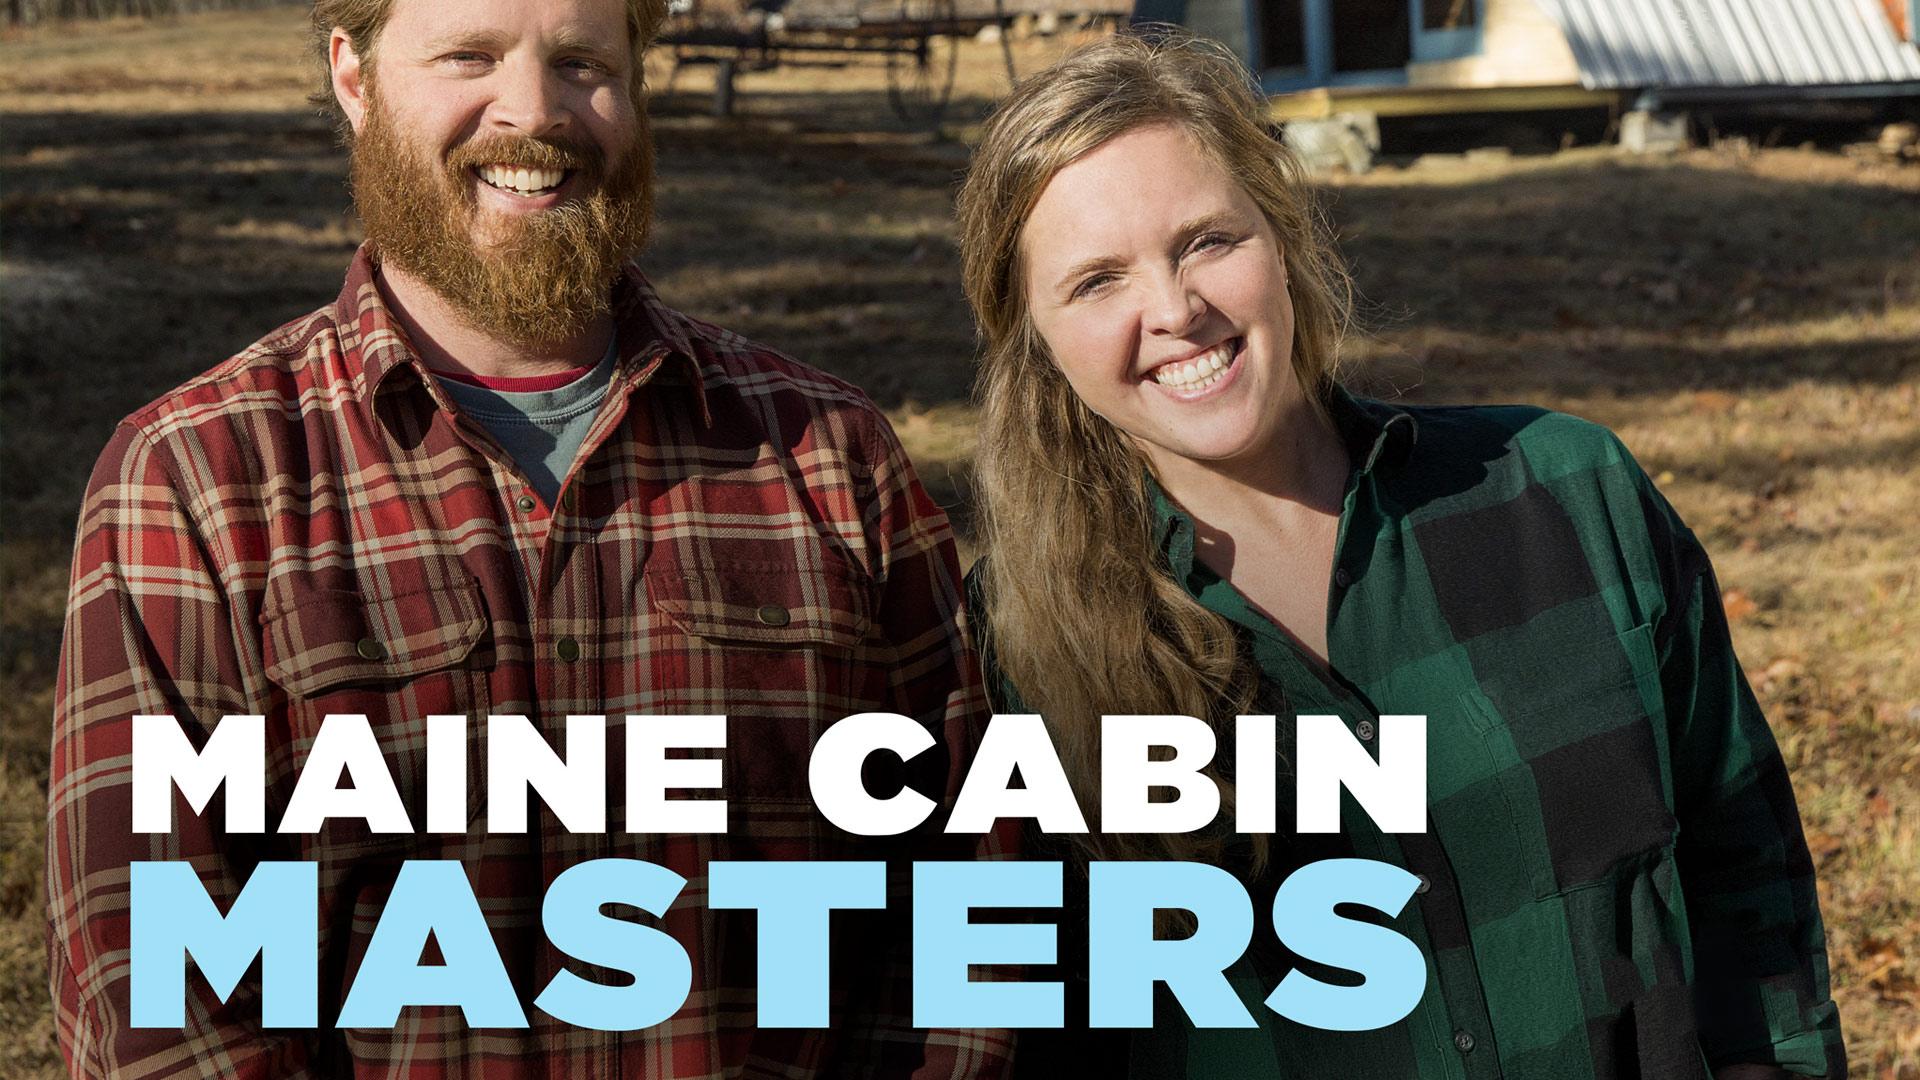 Maine Cabin Masters, Season 1